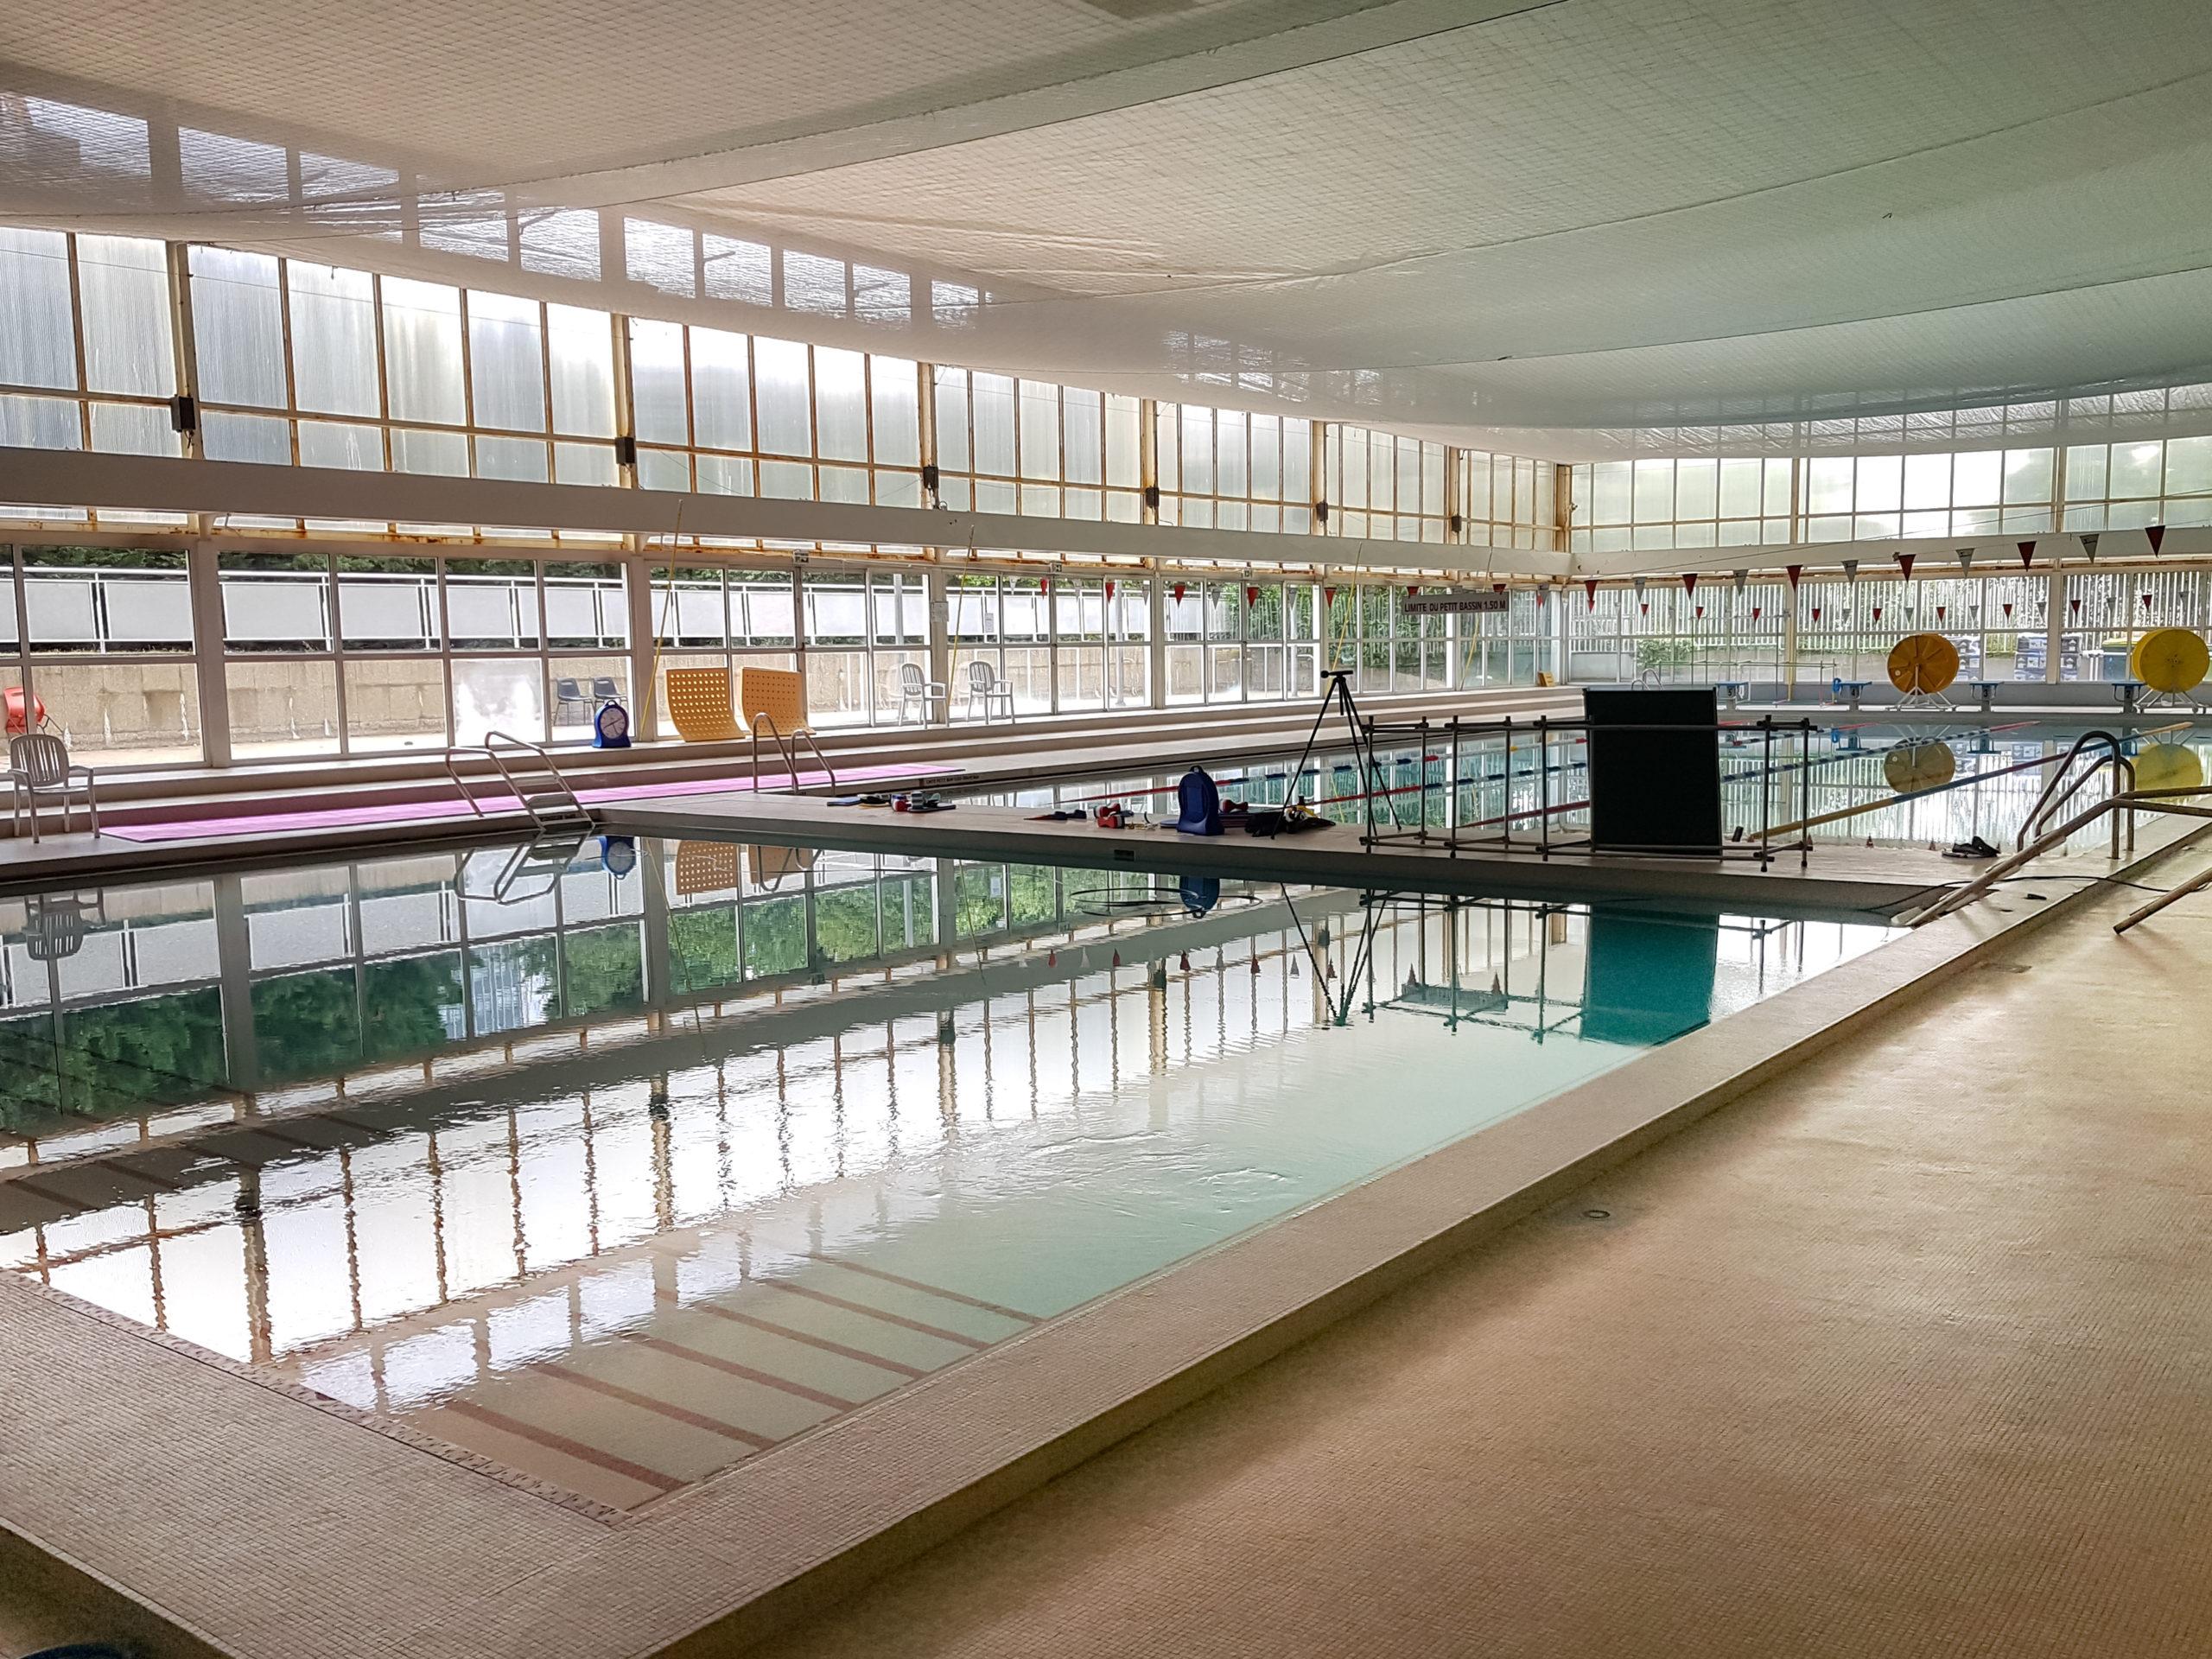 Traitements acoustiques dans les centres aquatiques